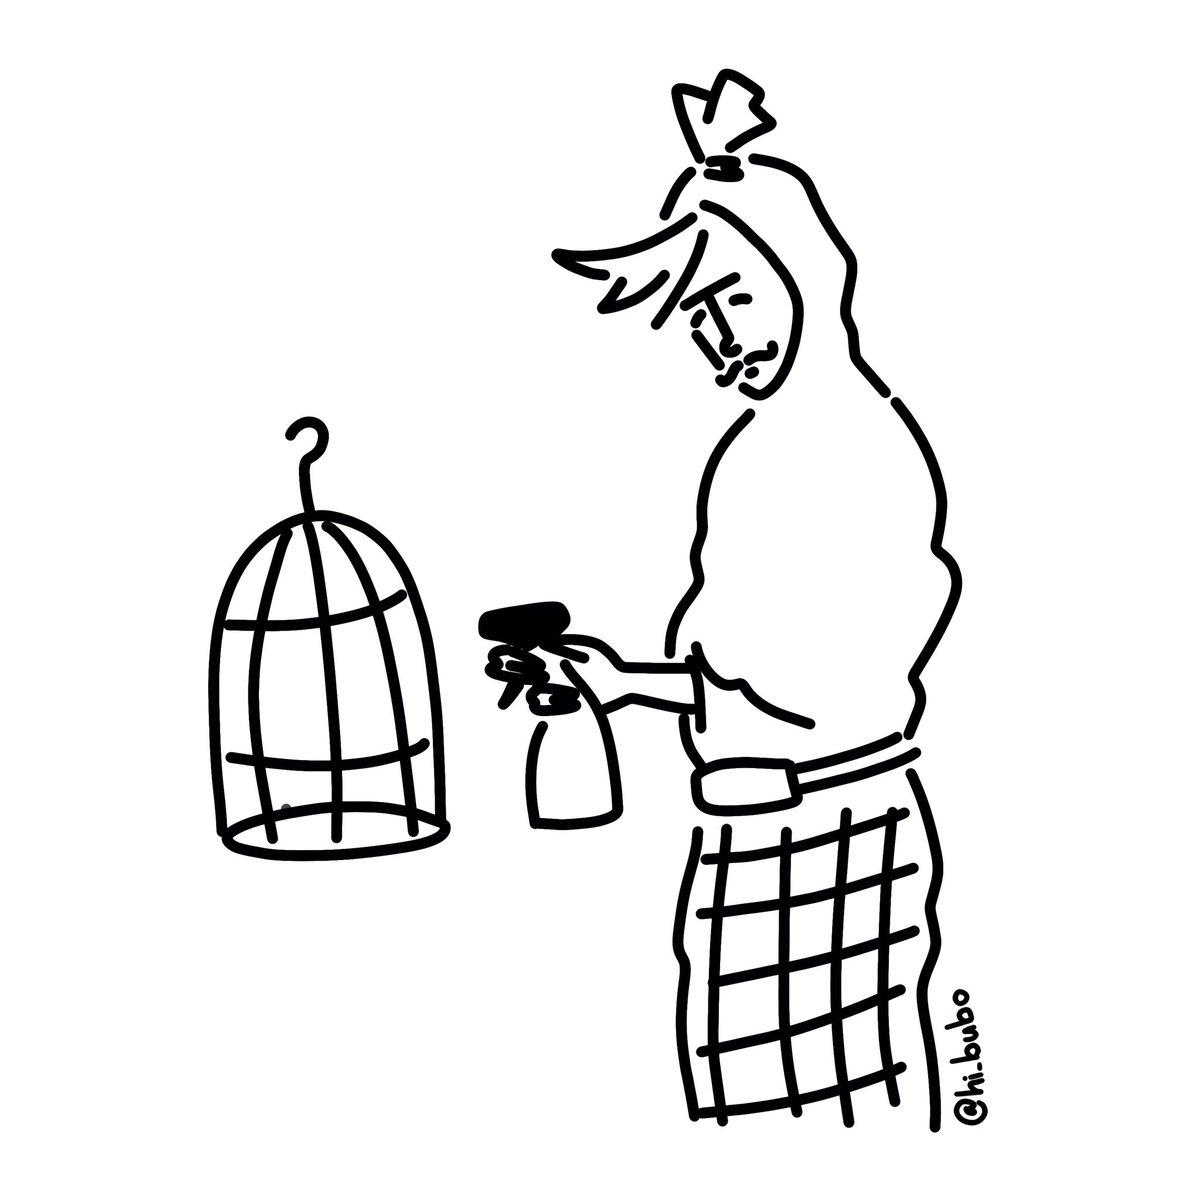 Bubo On Twitter Pocongie Daddy Lagi Mandiin Burung Hantu Selamat Hari Bapak Bapak Fathersday